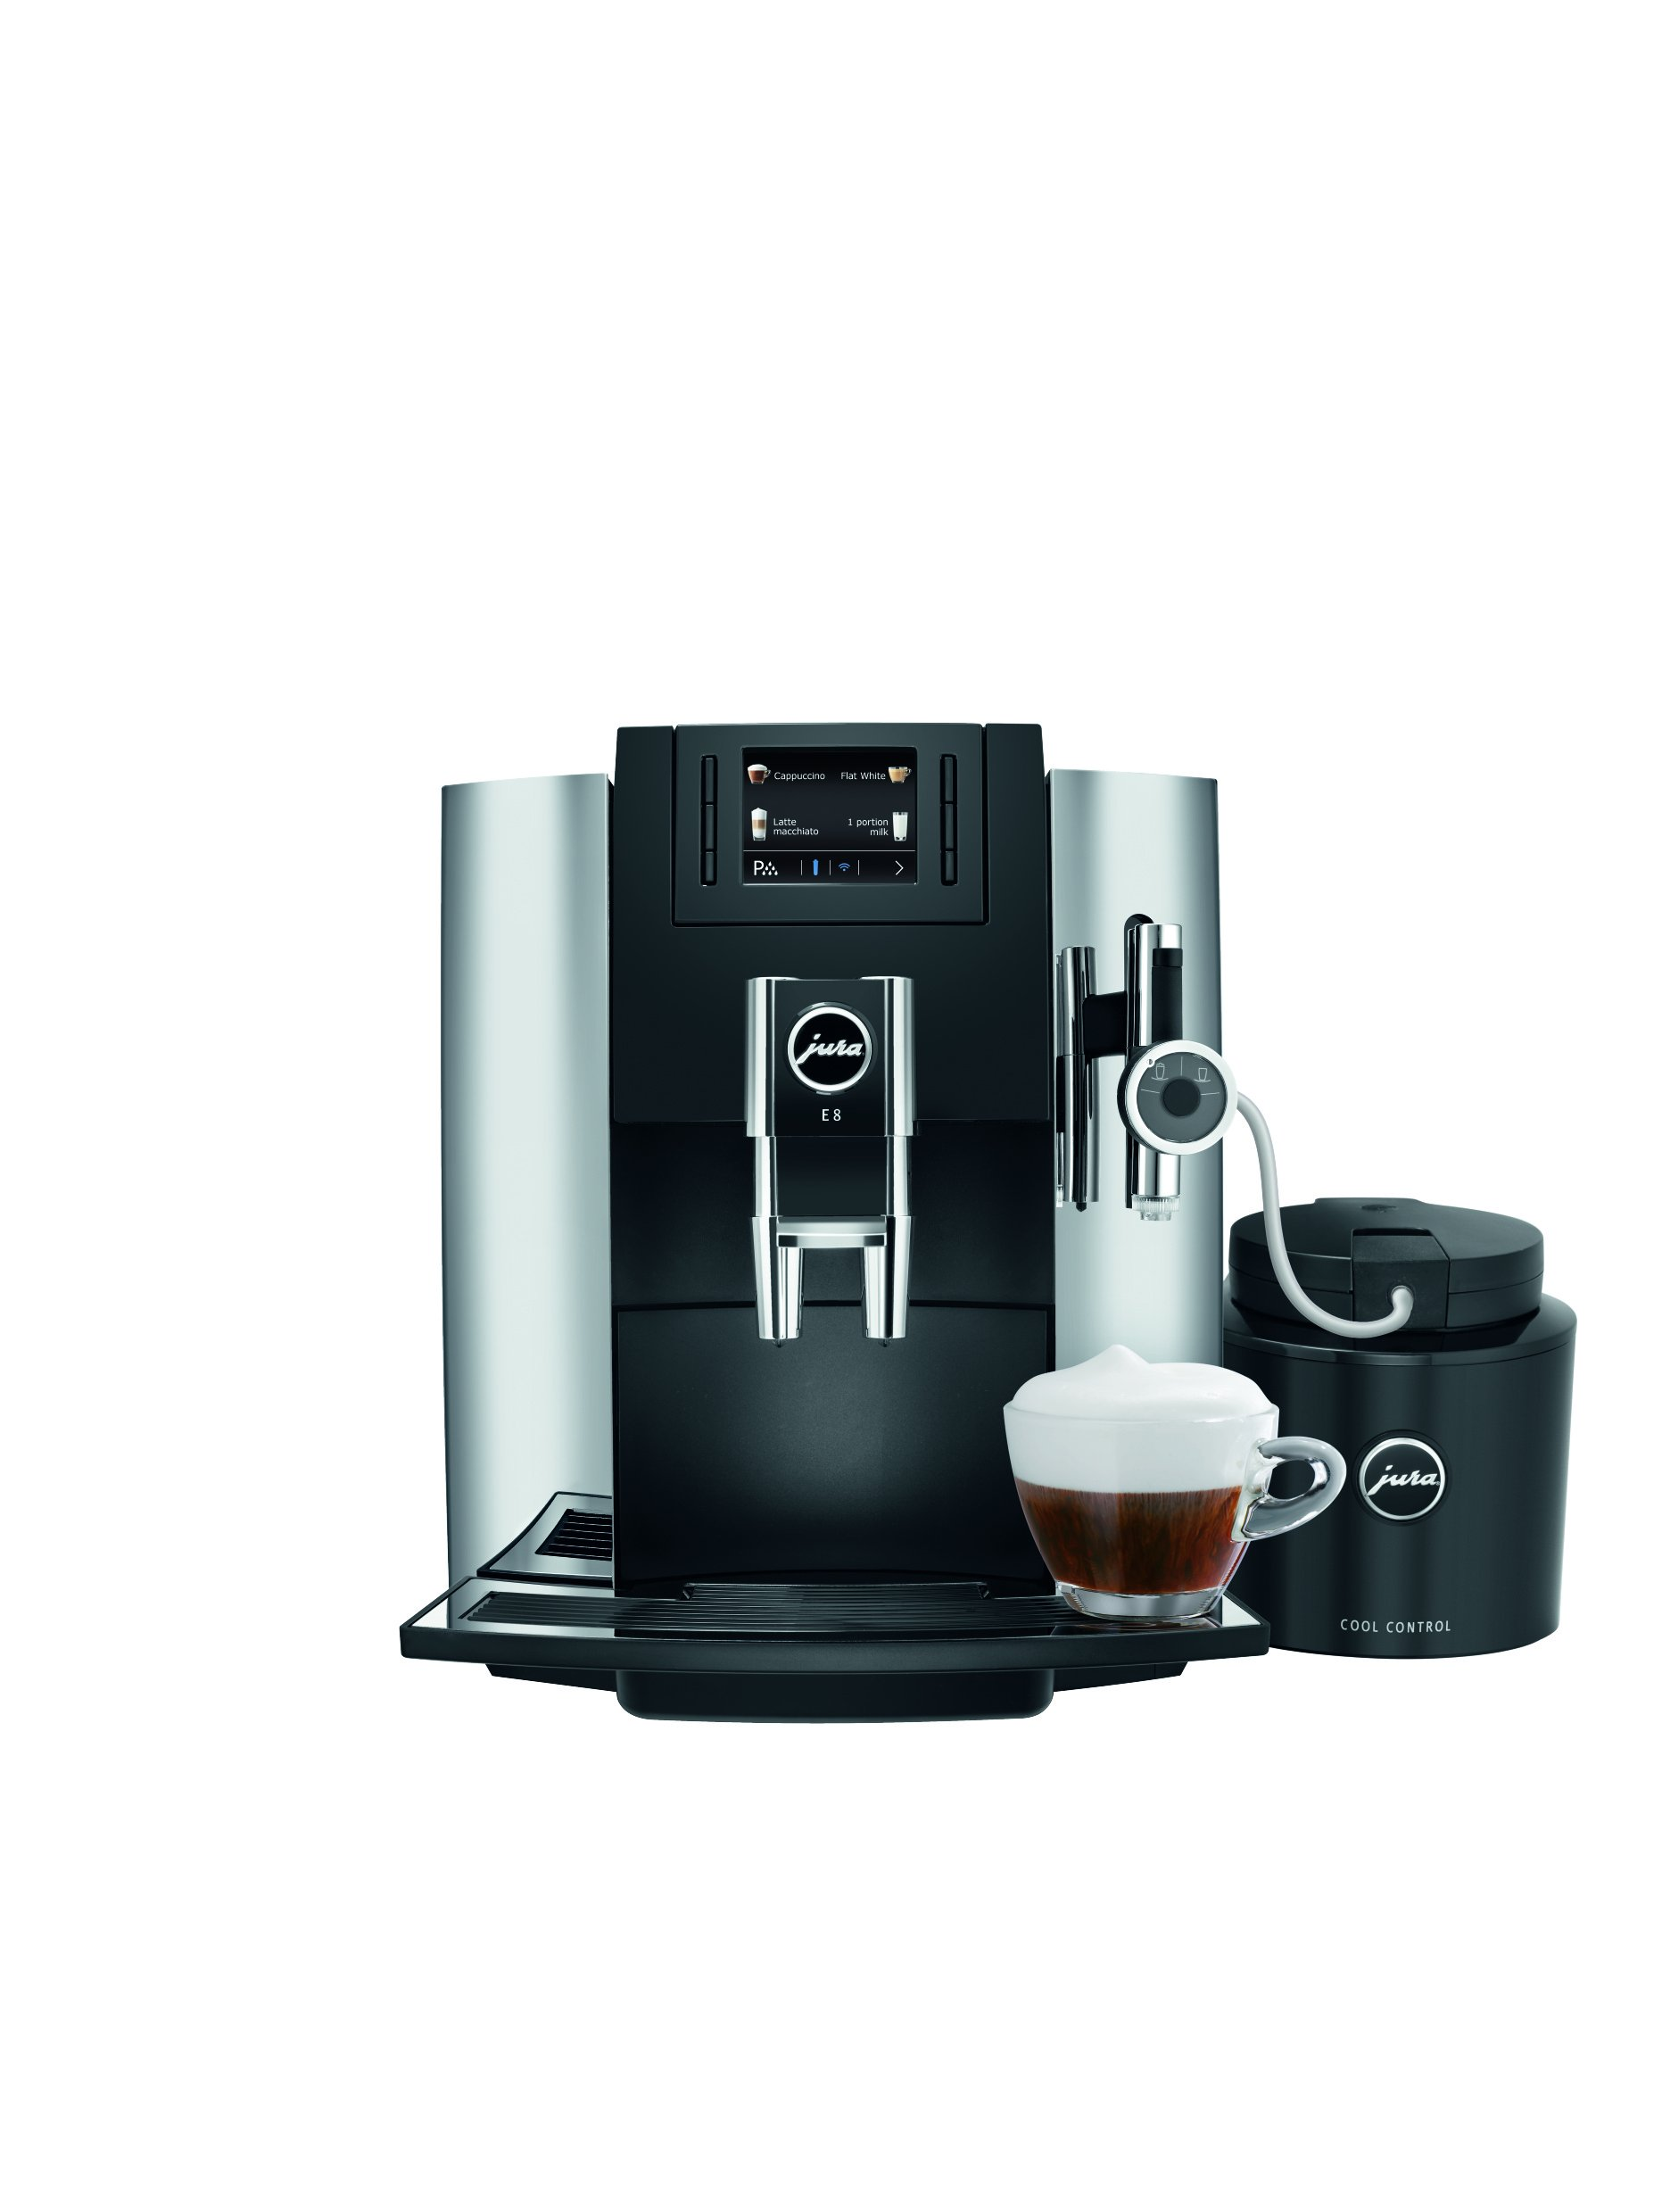 Jura 15097 E8 Espresso Coffee Machine, 28 cm x 35 cm x 35.1 cm, Chrome by Jura